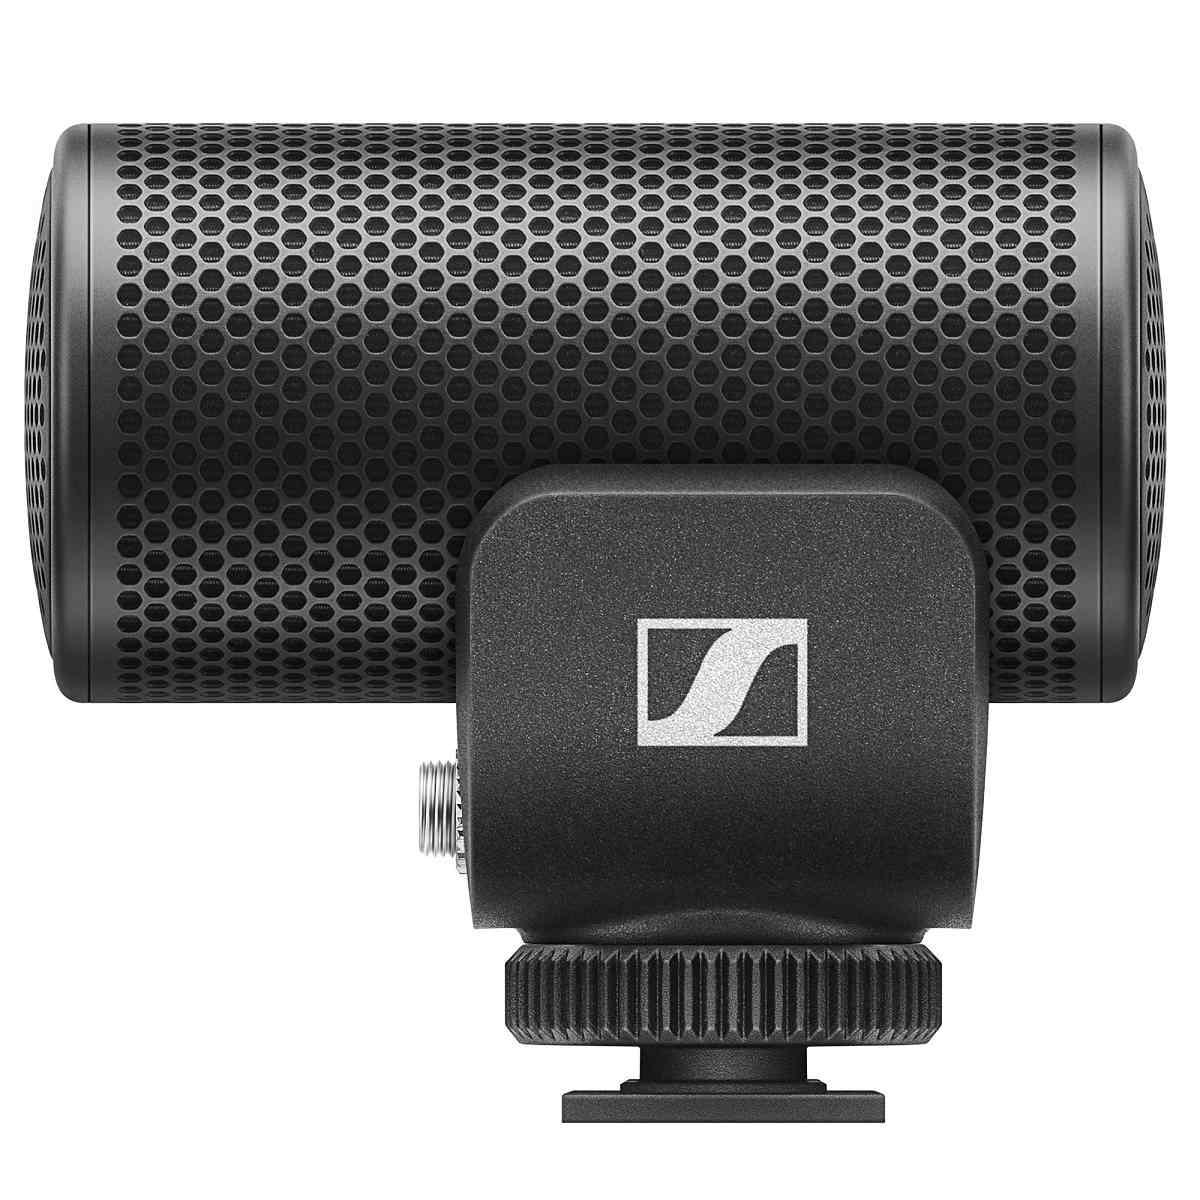 Microfone Supercardioide MKE200 Preto Sennheiser Profissional Ideal p/ Live e Câmeras